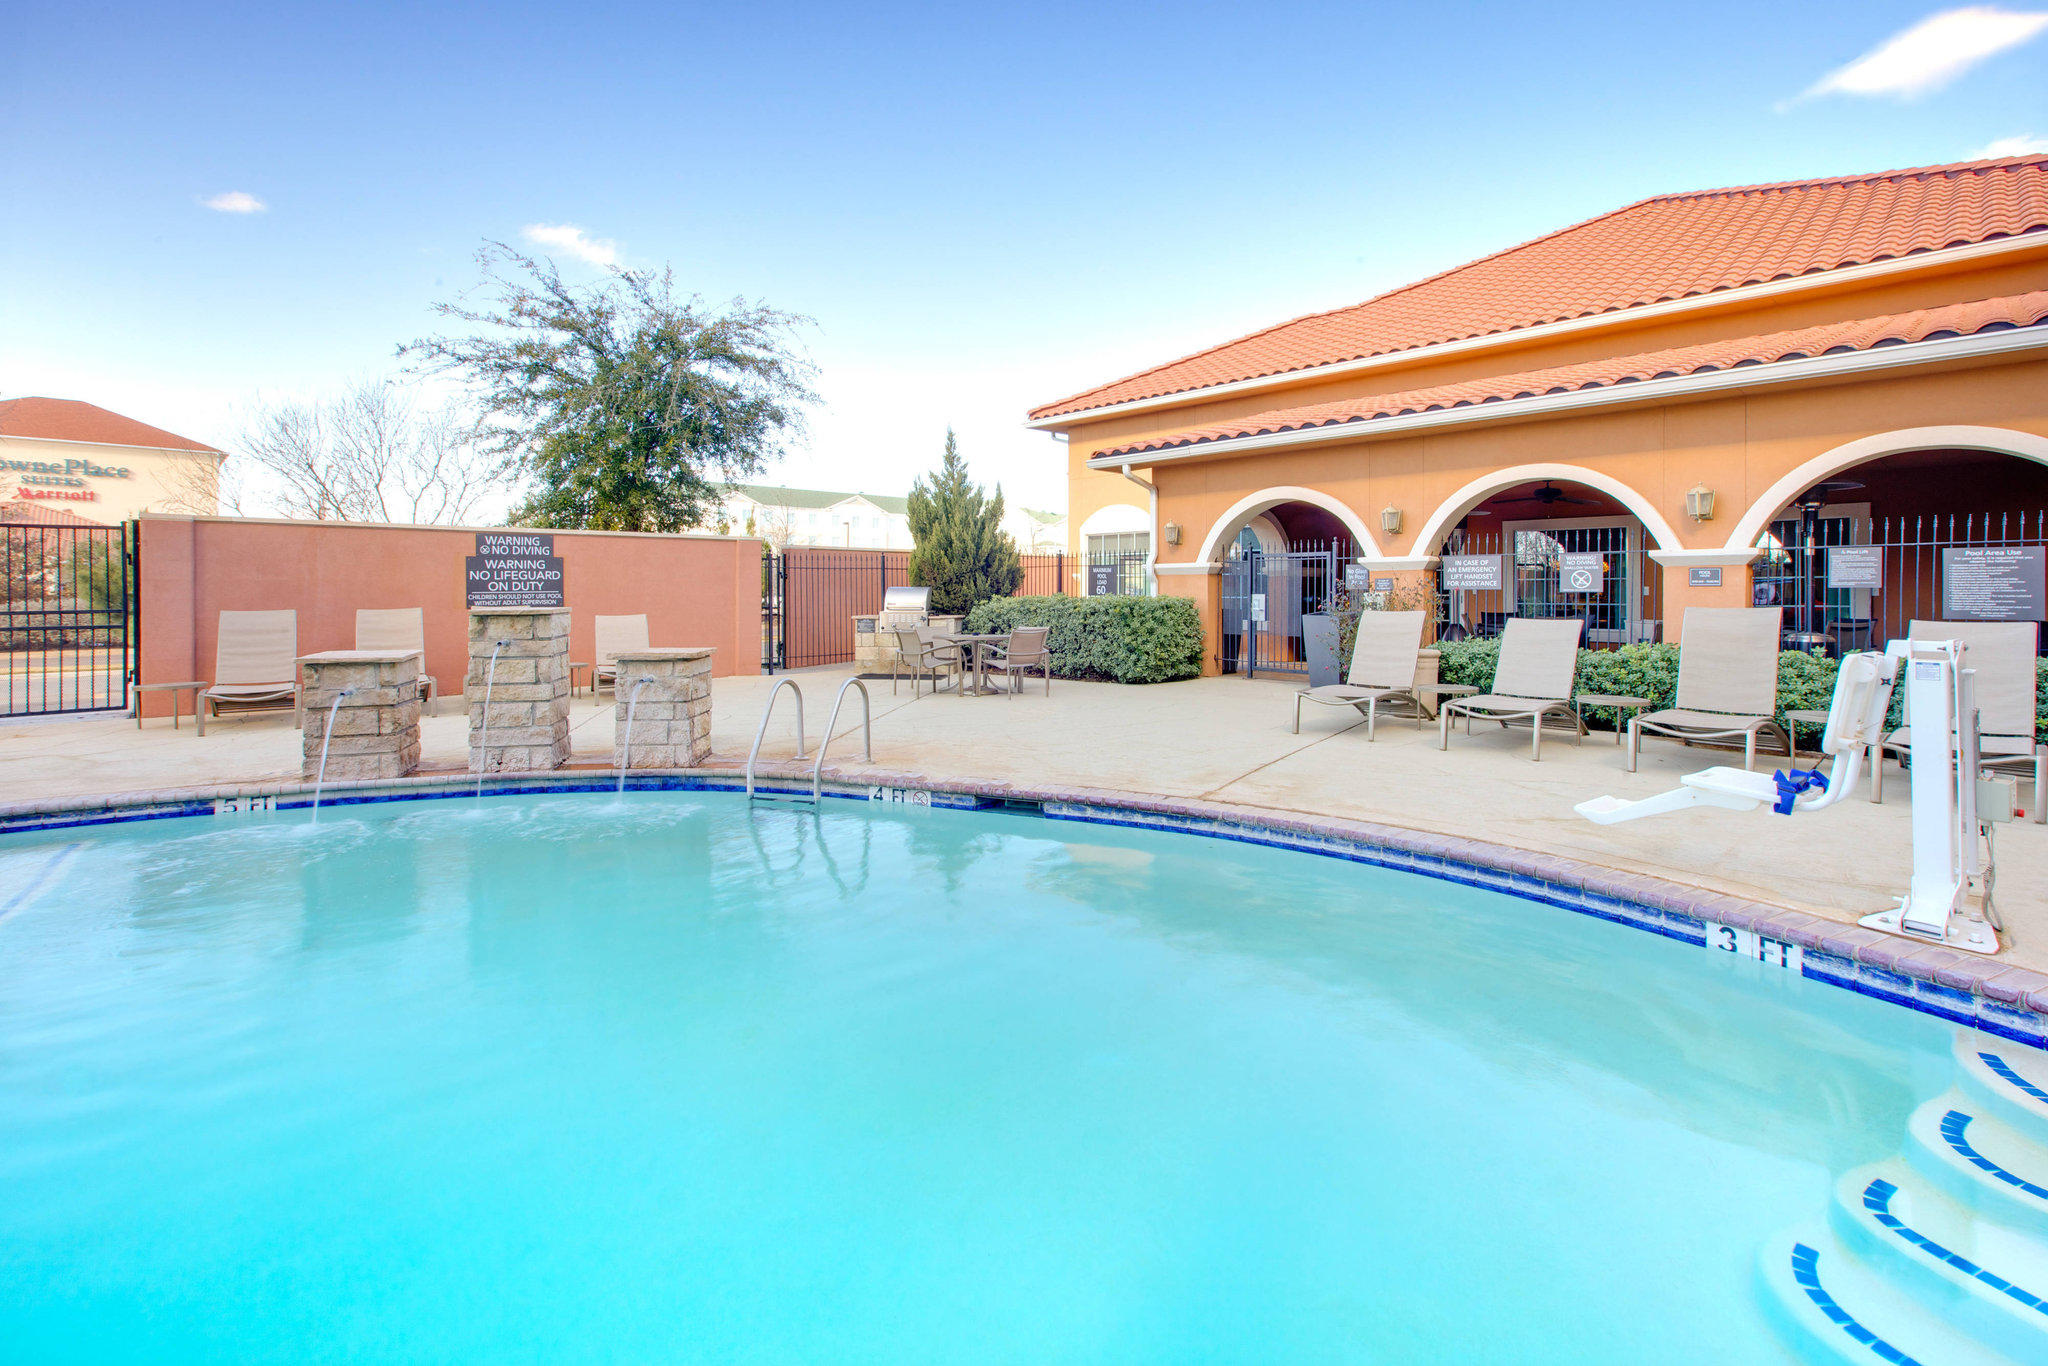 Residence Inn by Marriott Midland